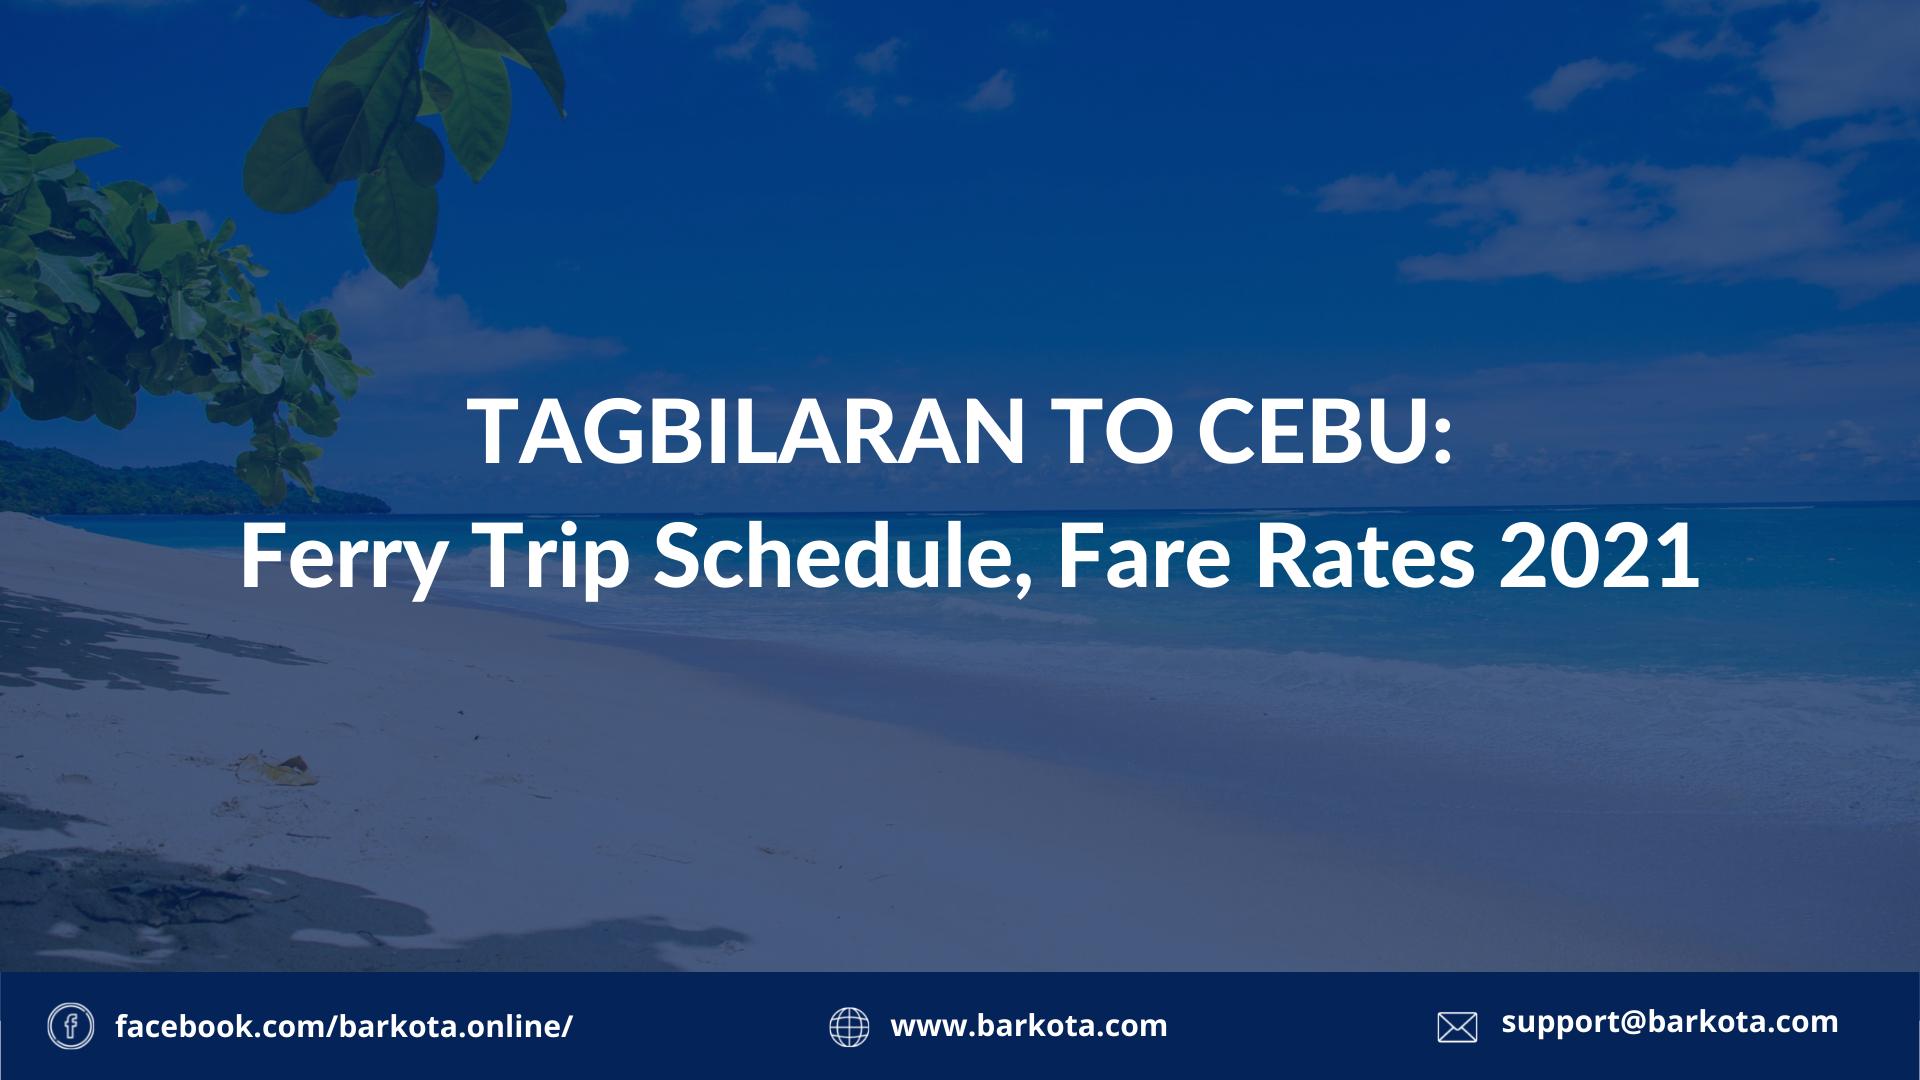 tagbilaran to cebu ferry schedule